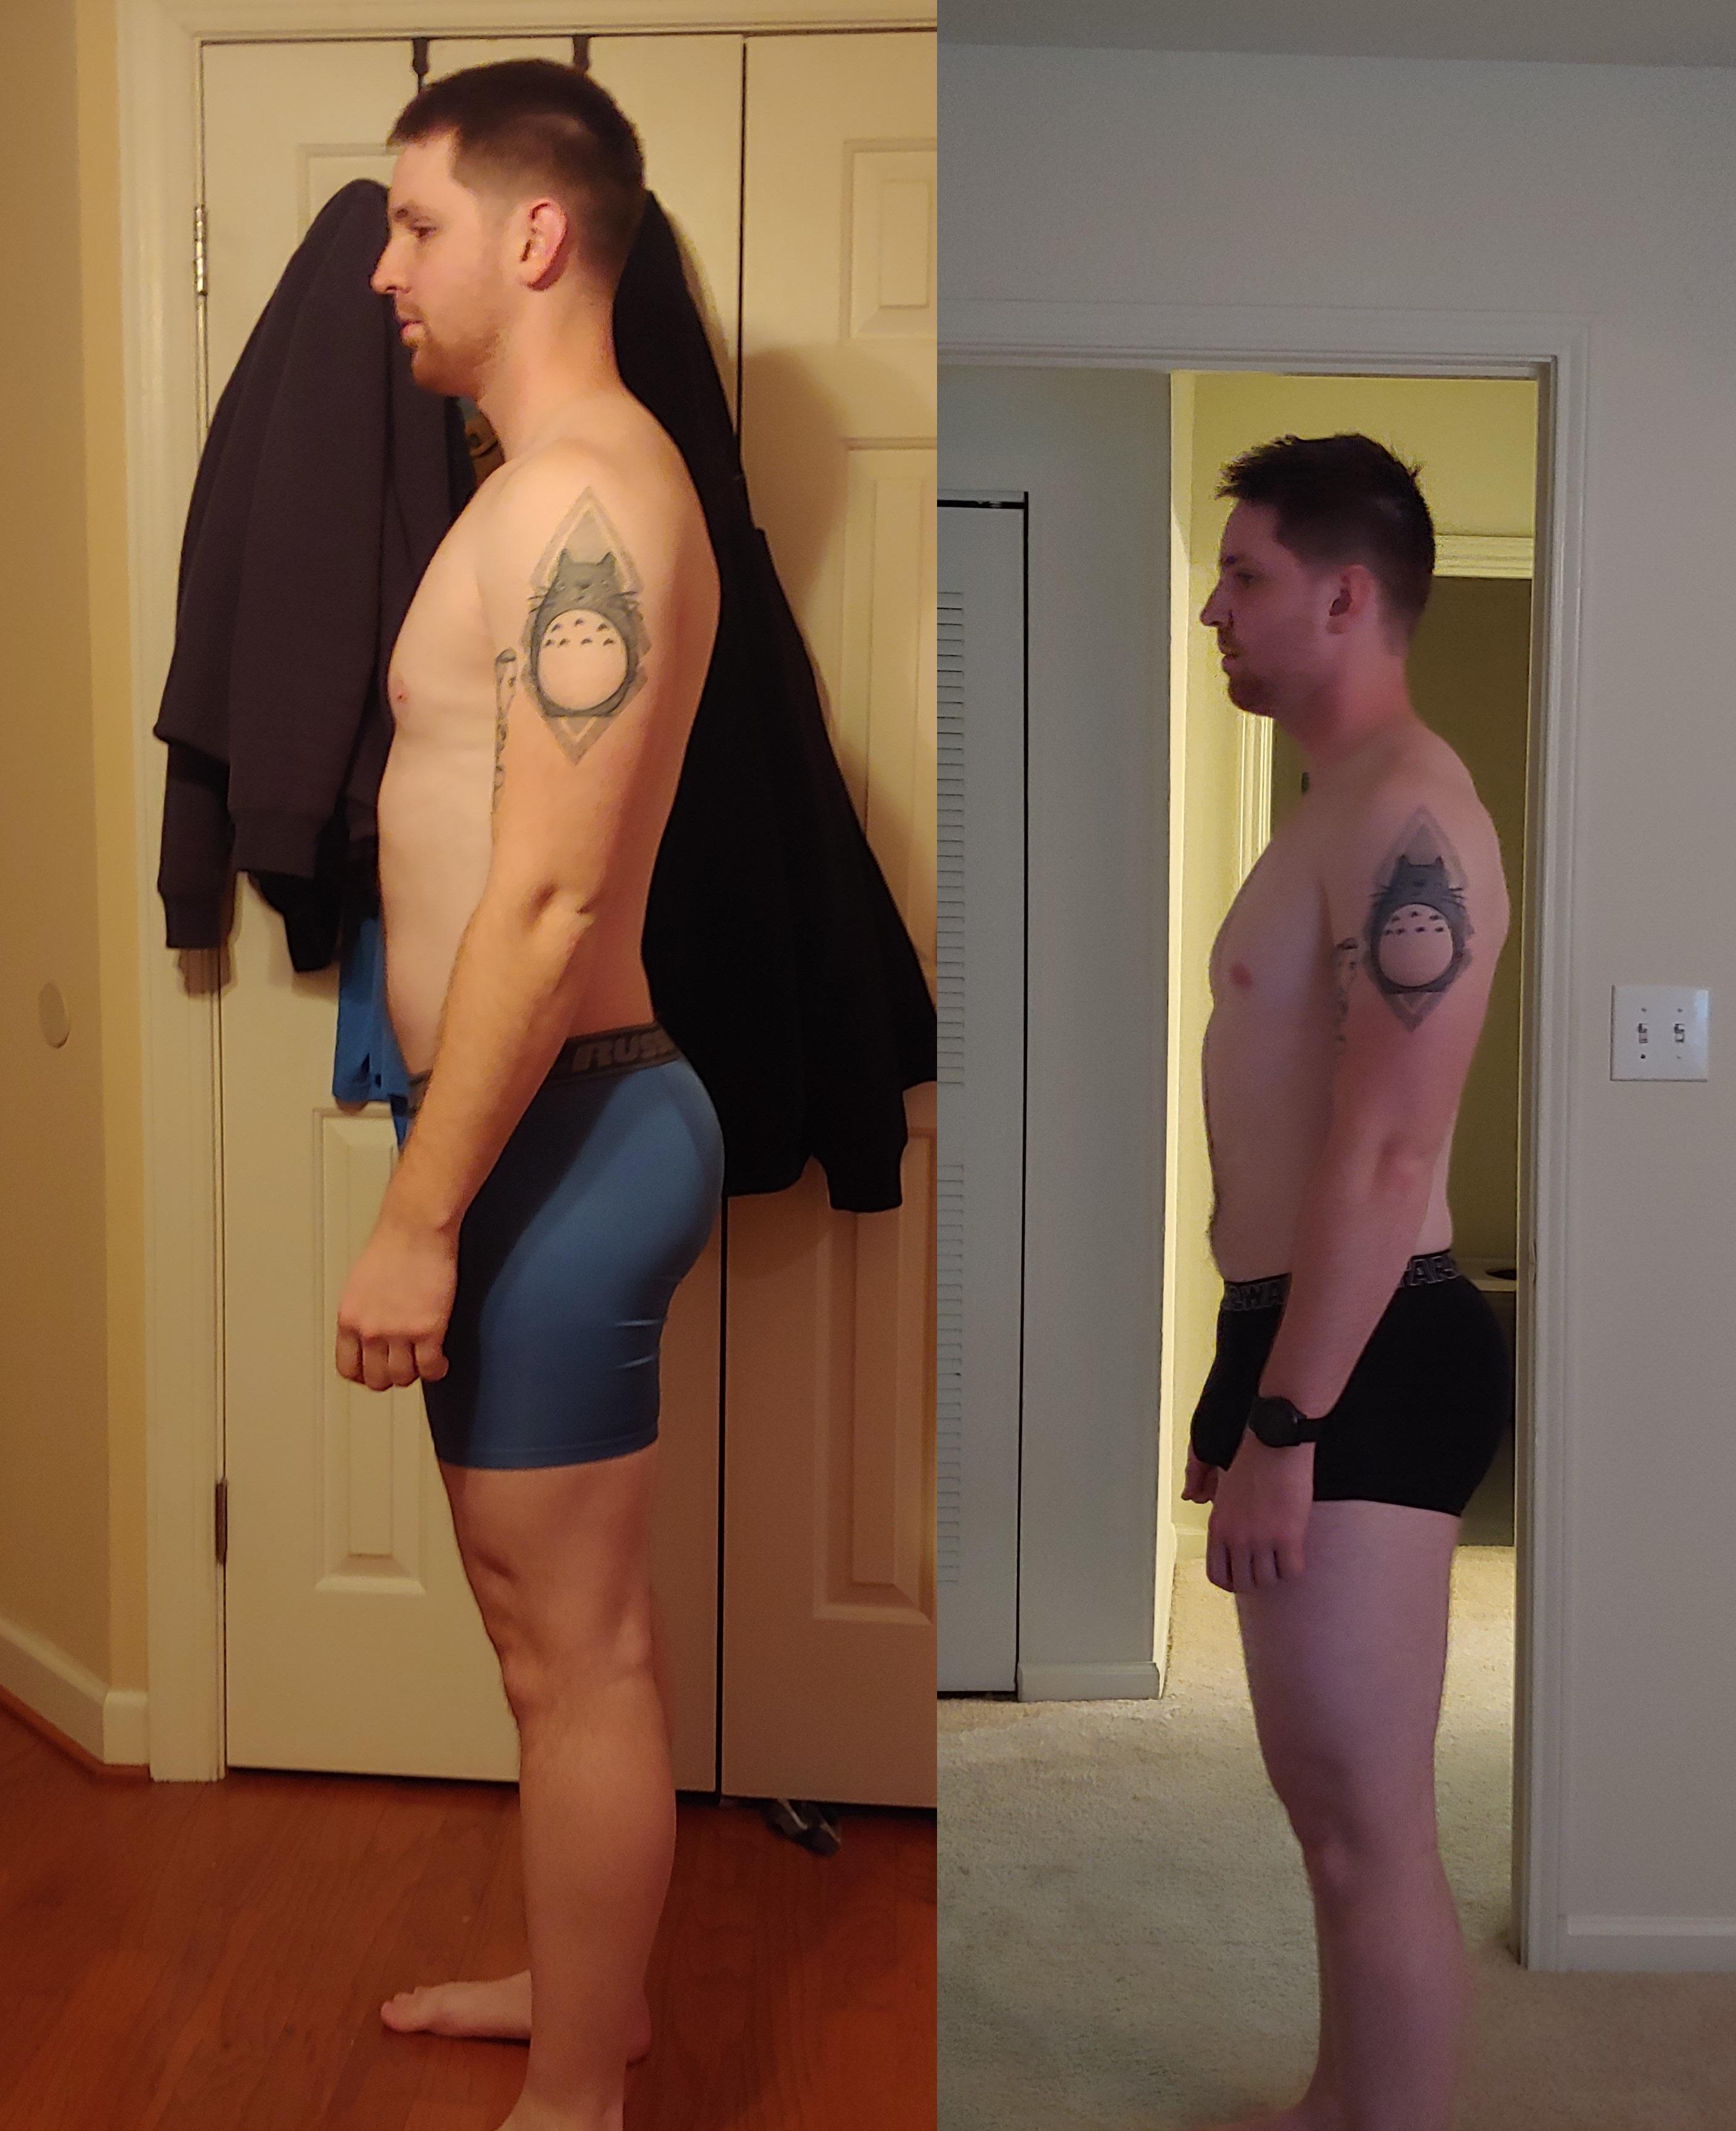 6'1 Male 7 lbs Muscle Gain 195 lbs to 202 lbs